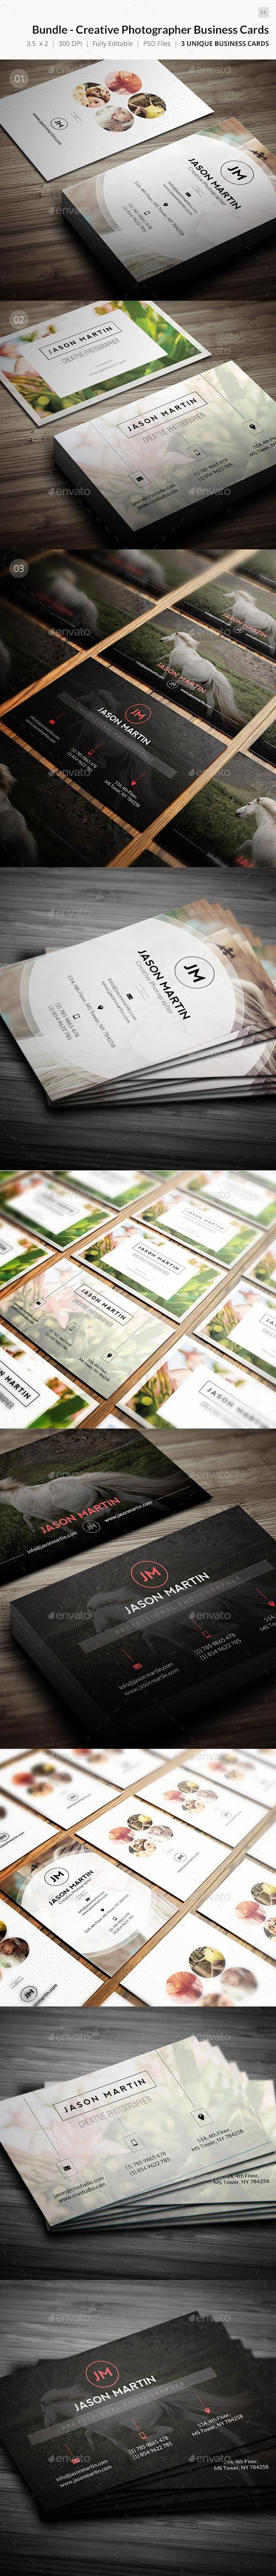 GraphicRiver Bundle Creative Photographer Business Card 51 9723436